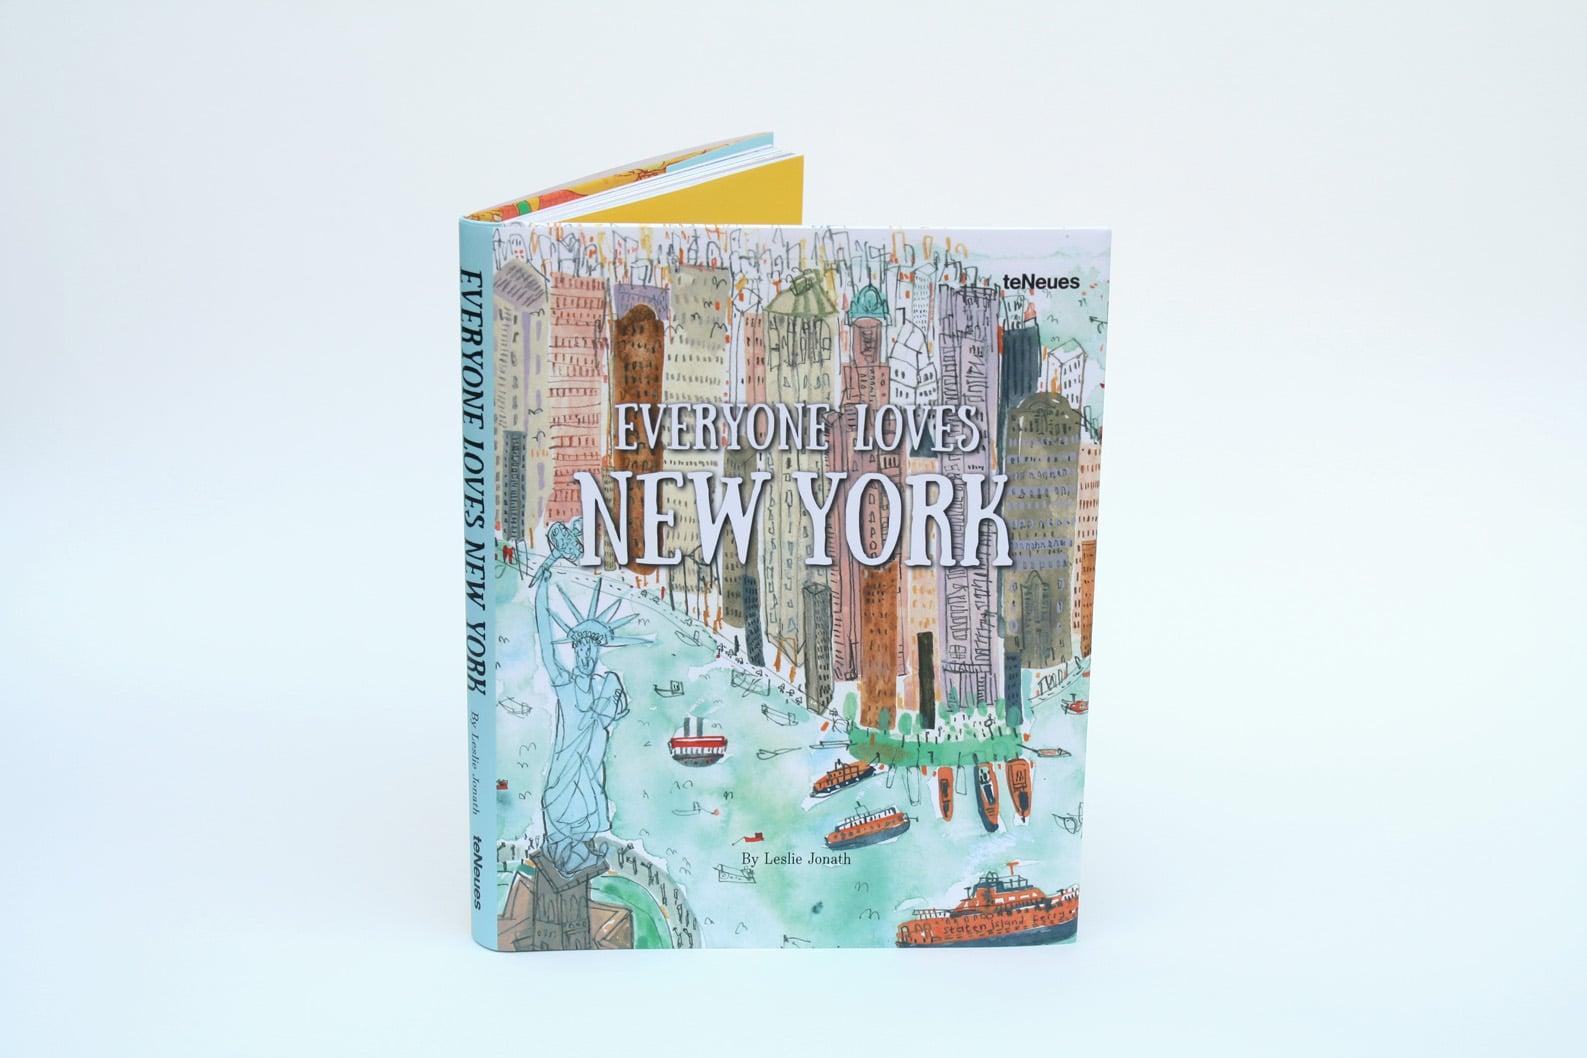 everyone_loves_New_York_clare caulfield.jpg